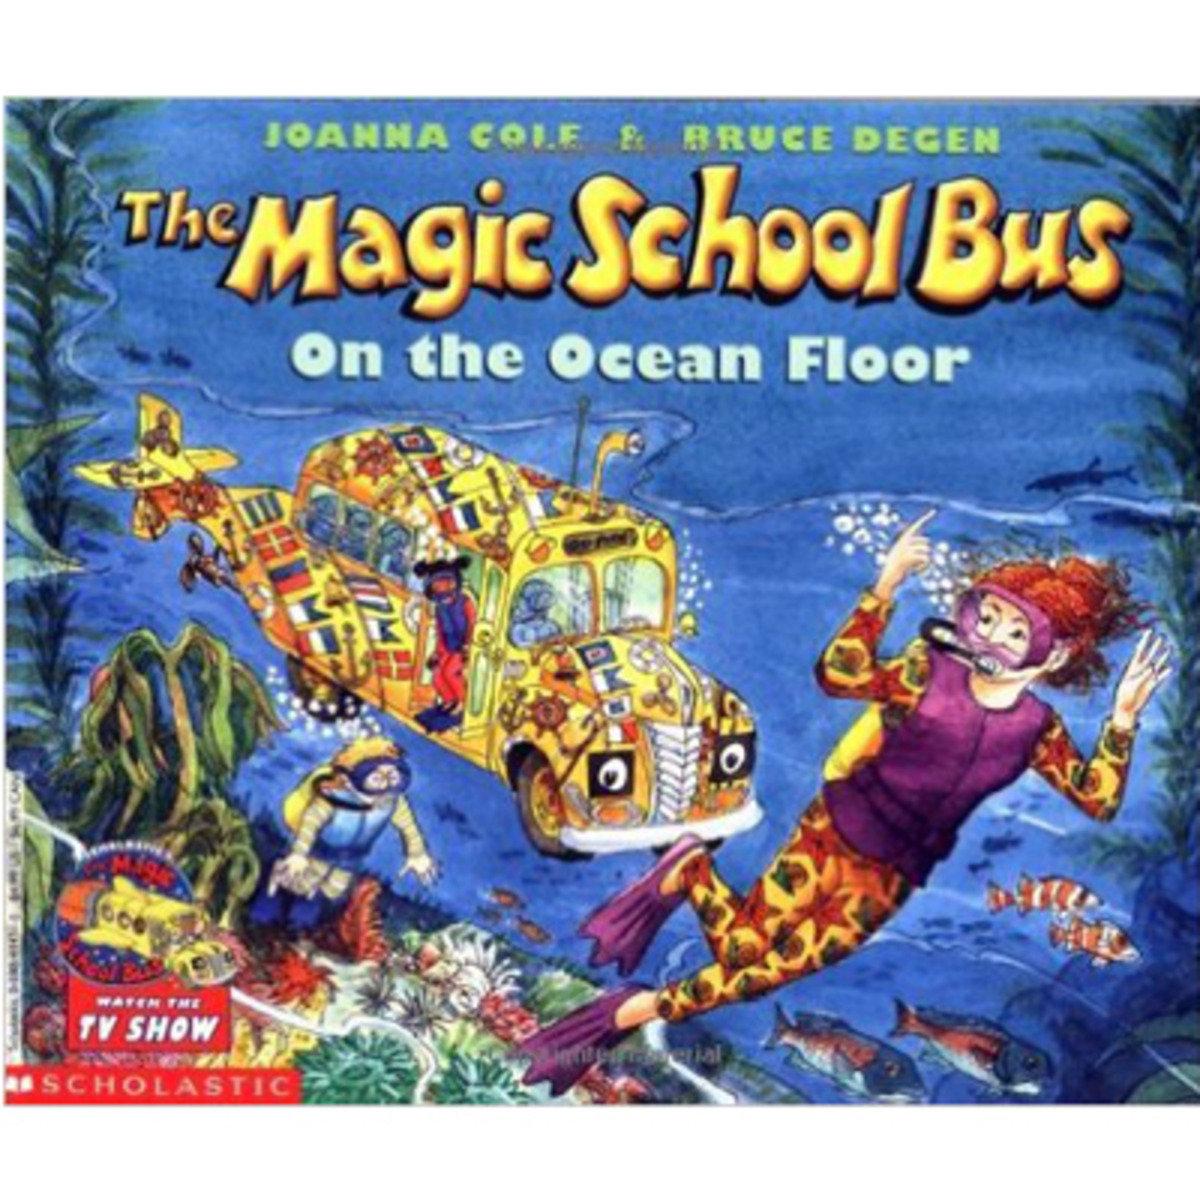 THE MAGIC SCHOOL BUS ON THE OCEAN FLOOR 9780590414319